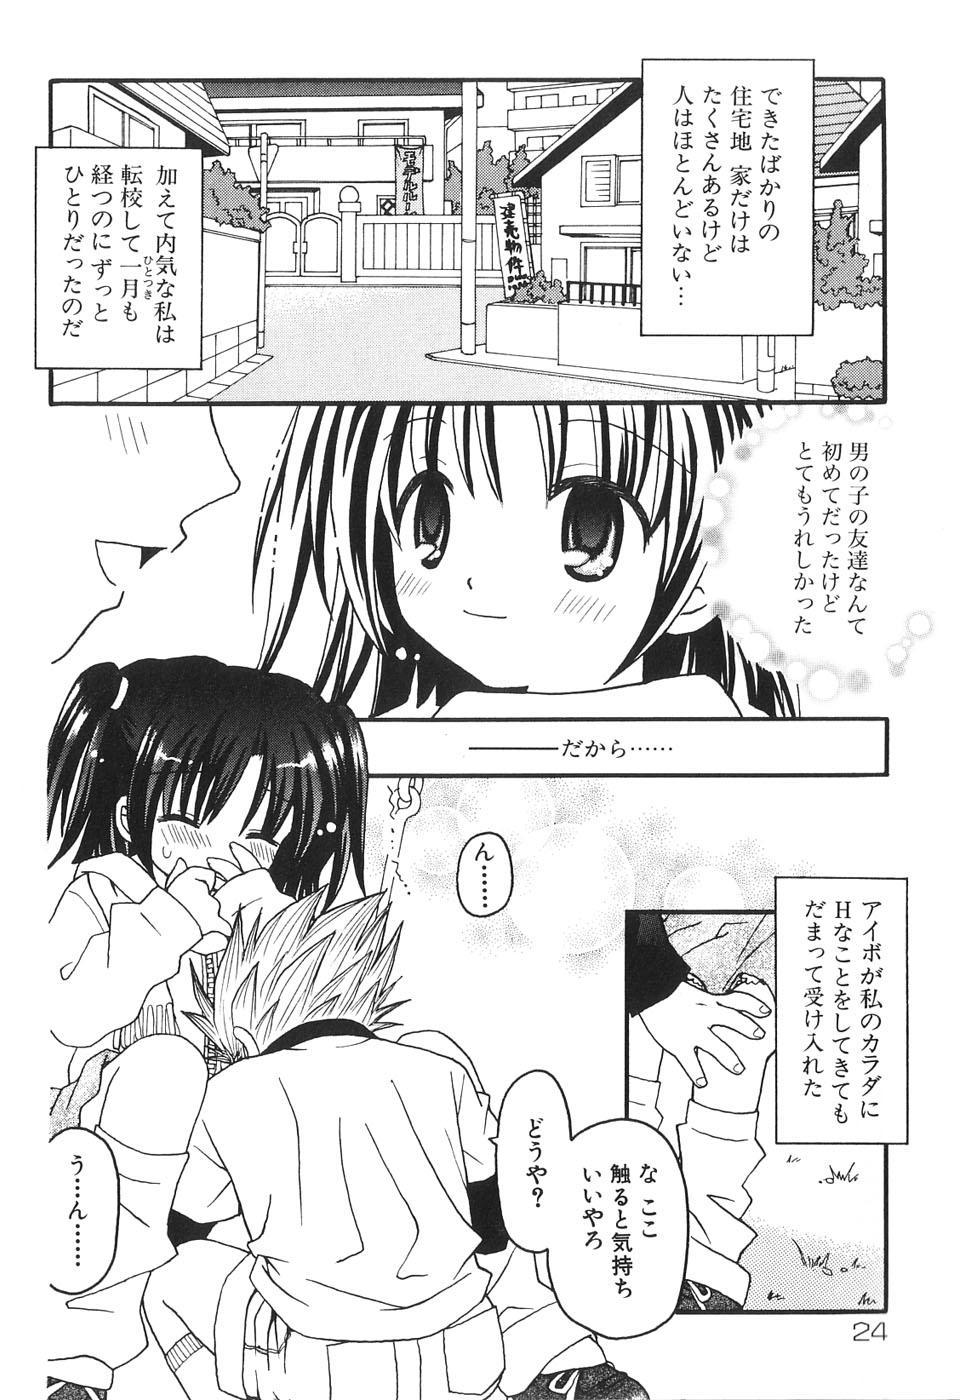 Musoubana 25